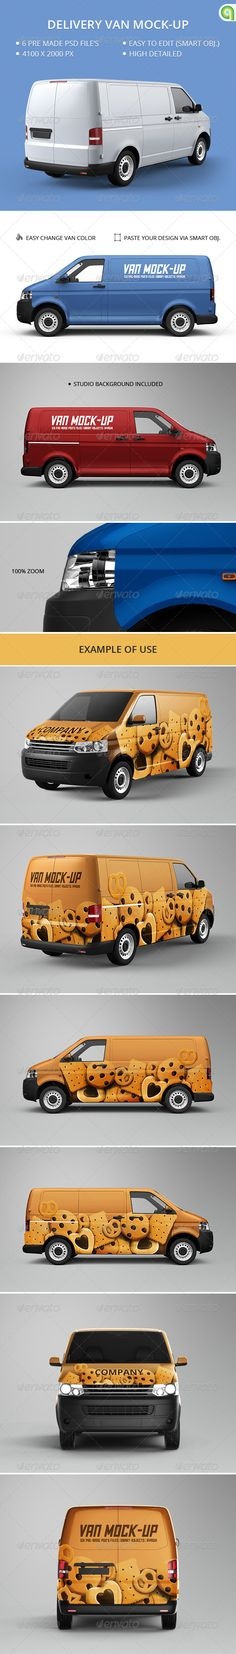 Van Mock-Up. #Mockup #van T4, Van Mock up, auto, automobile, brand, branding, car, company, delivery, design, lorry, mockup, photorealistic, print, service, t5, transport, truck, van, van mock-up, van mockup, vehicle, wrap, wraps